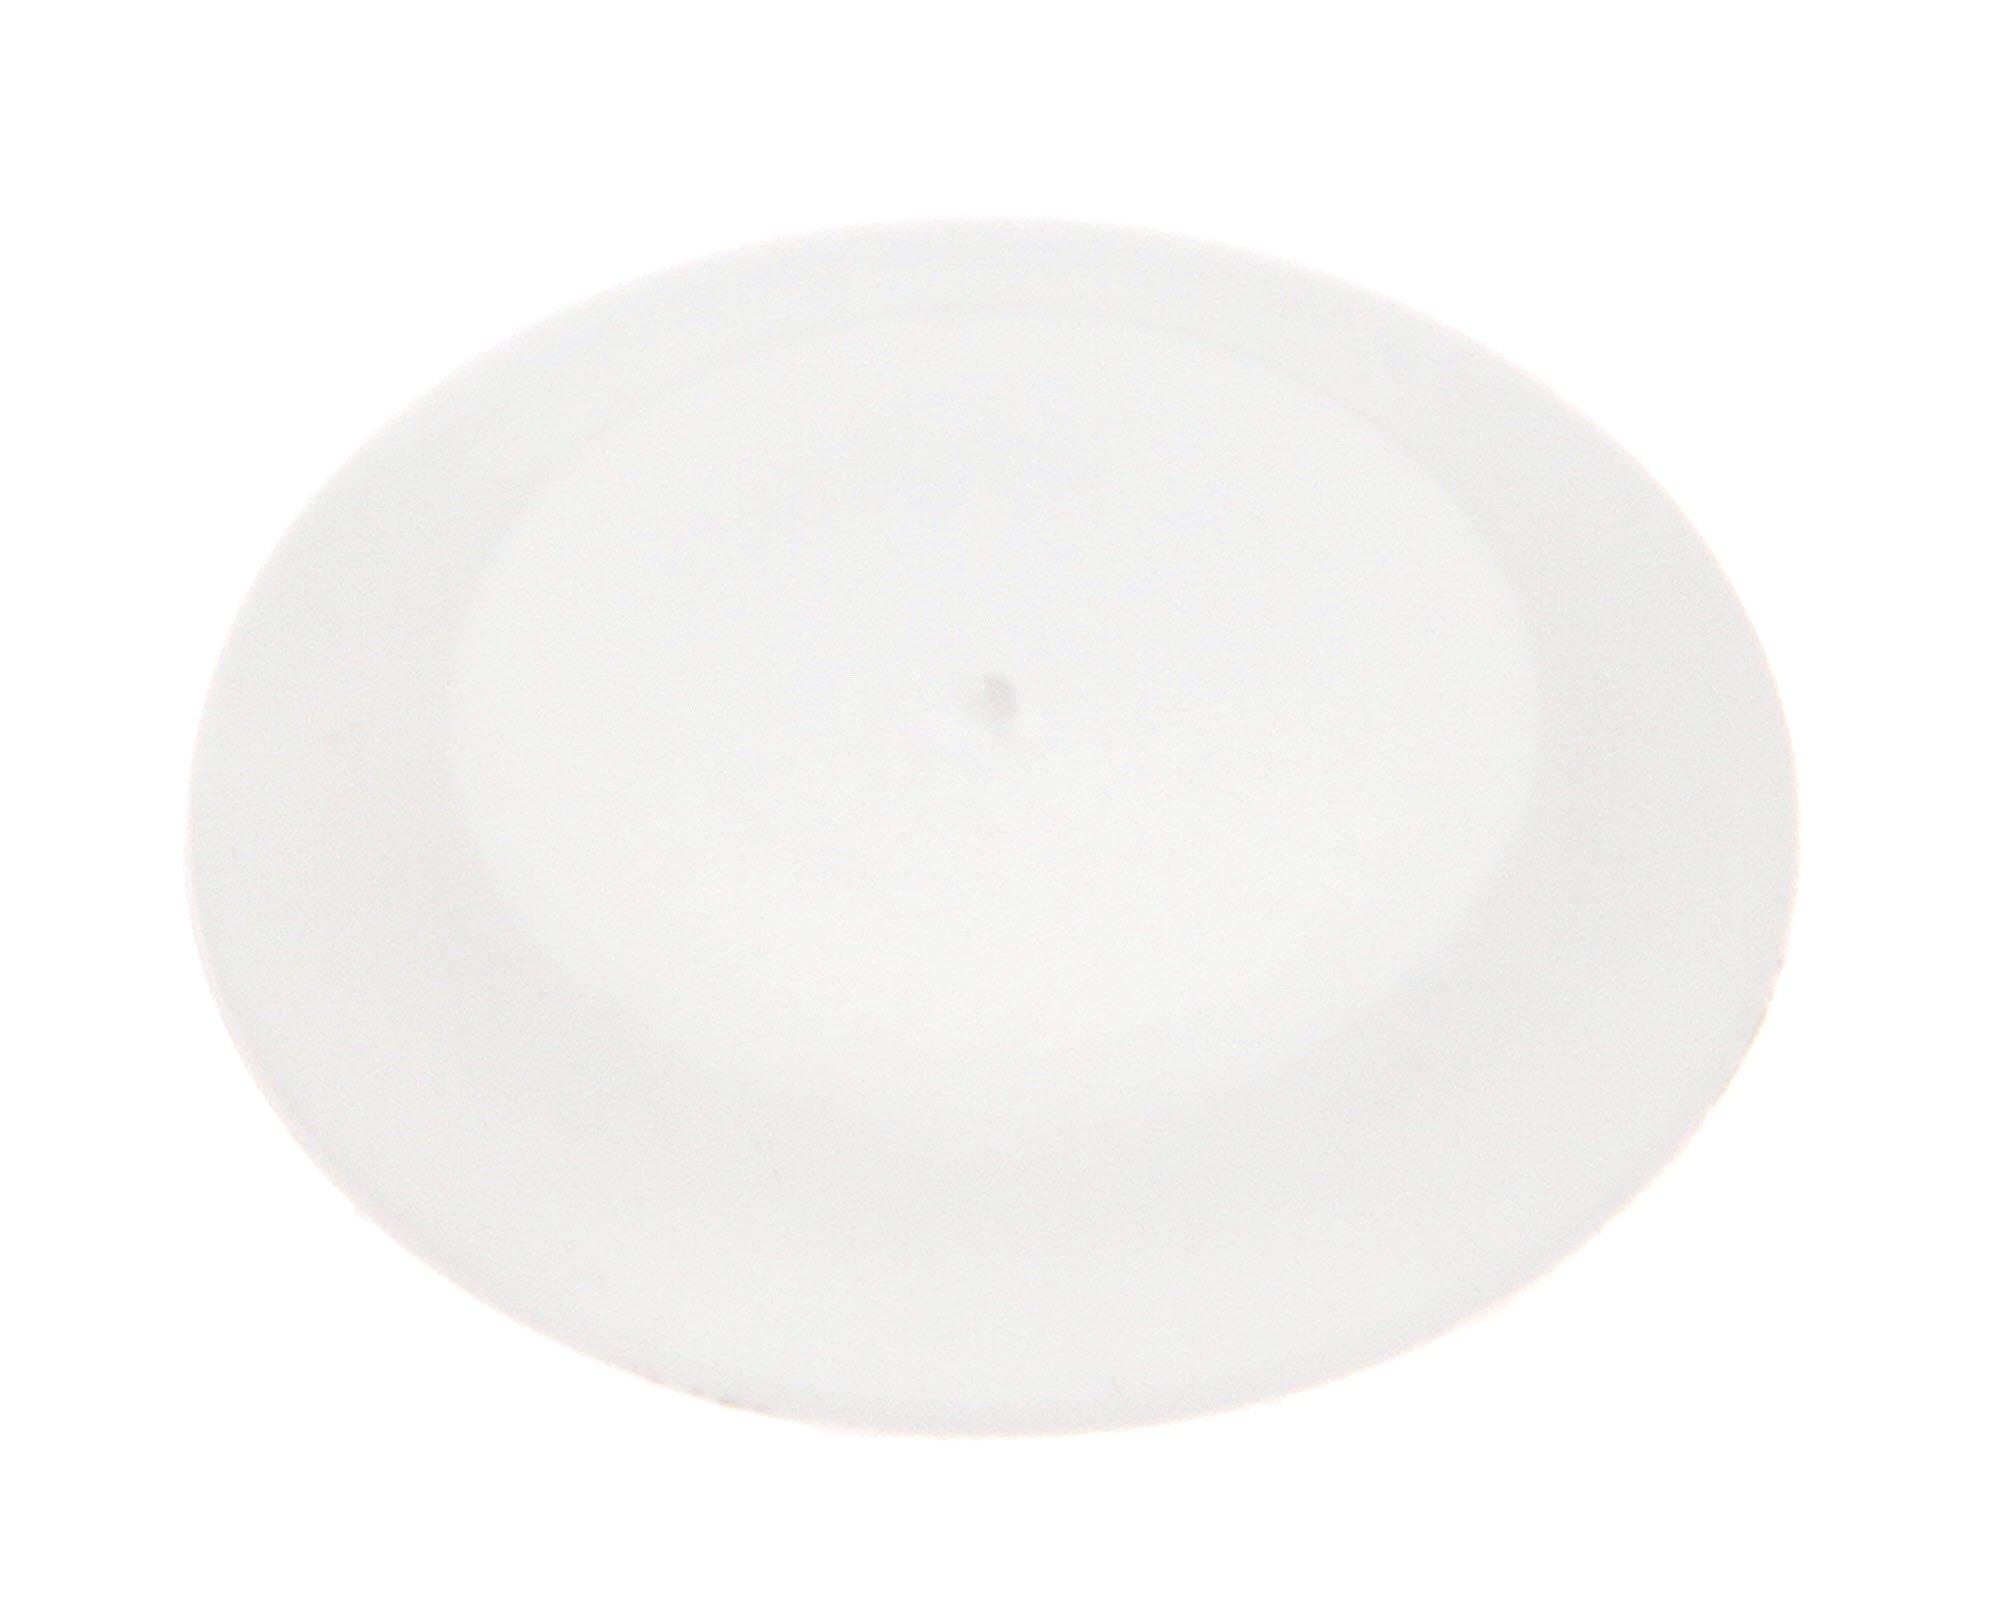 Kolpak 254071075 Plug Button 3/4 White Plastic